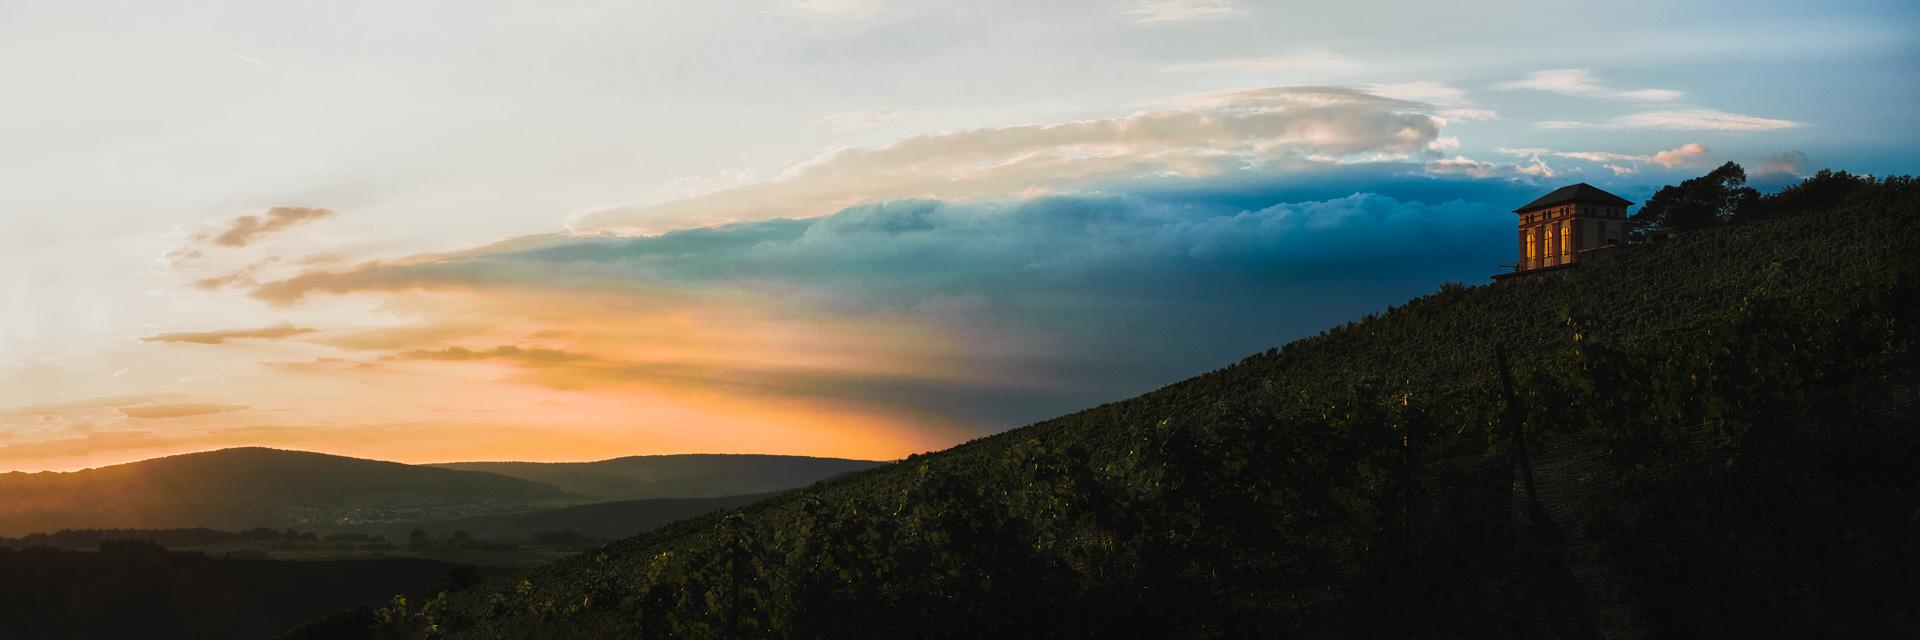 Sonnenuntergang mit blau-orangenem Himmel am Weinberg